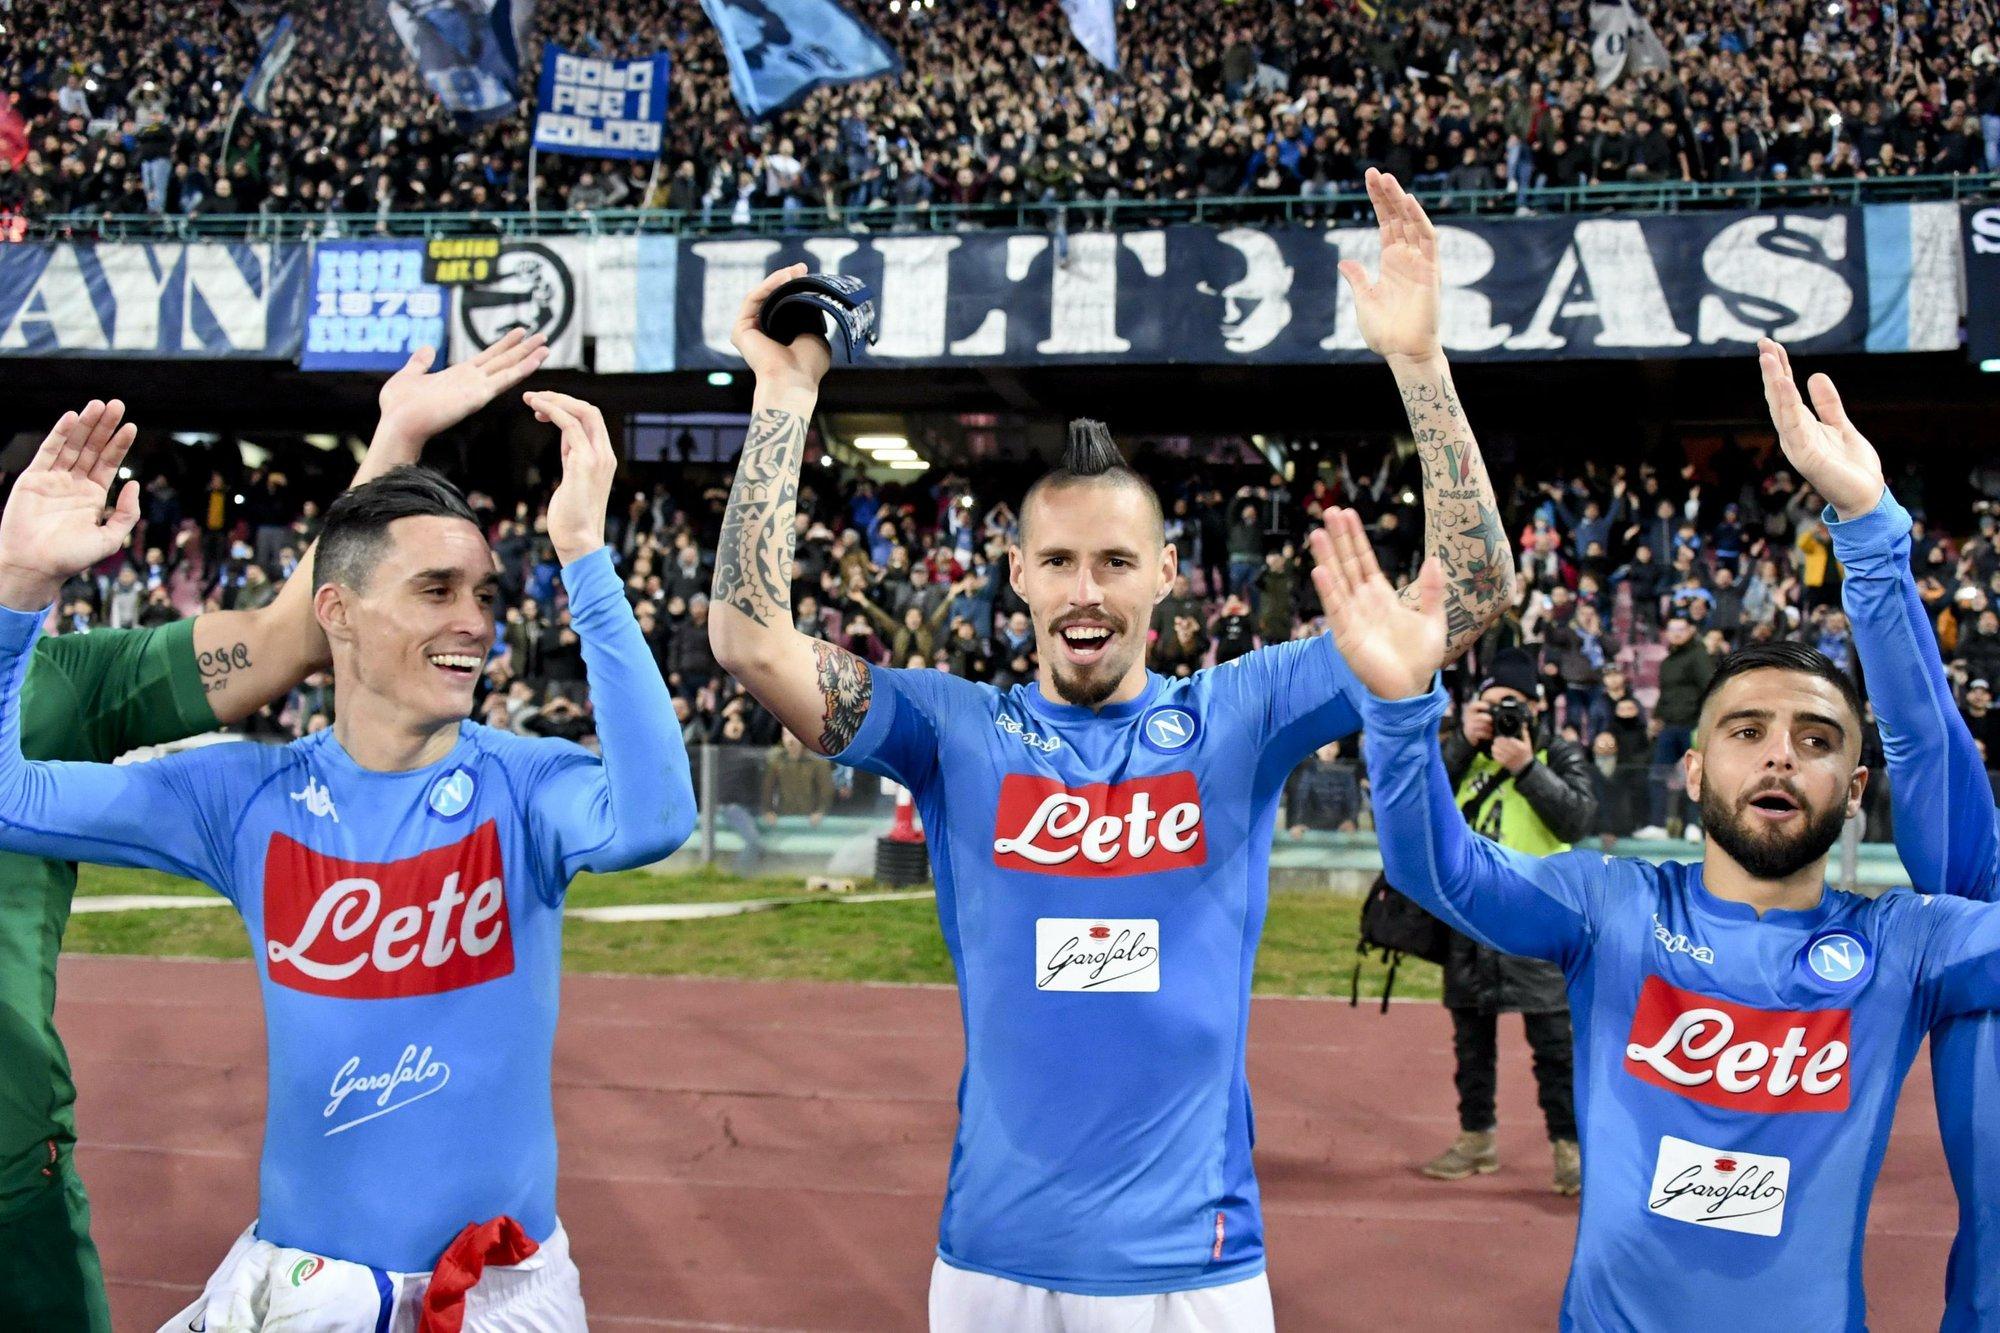 Récord de Hamsik y Napoli conserva liderato en Serie A 62c3b1c86e8b2